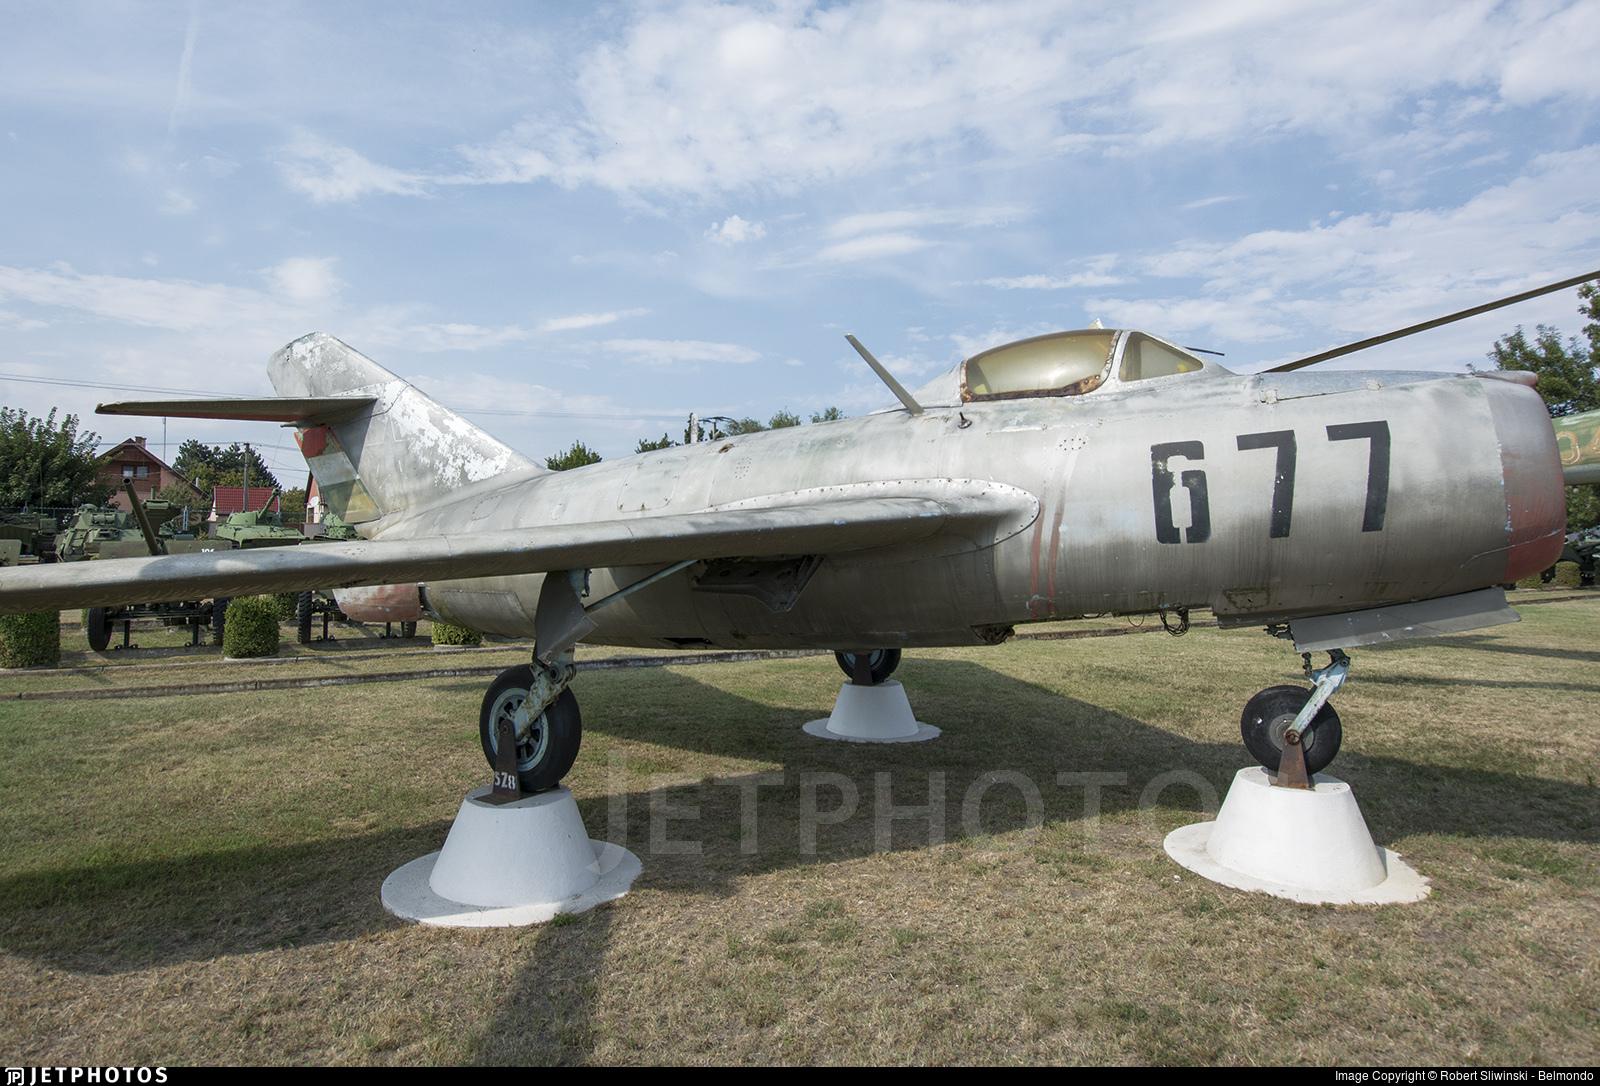 677 - Mikoyan-Gurevich MiG-15bis Fagot - Hungary - Air Force